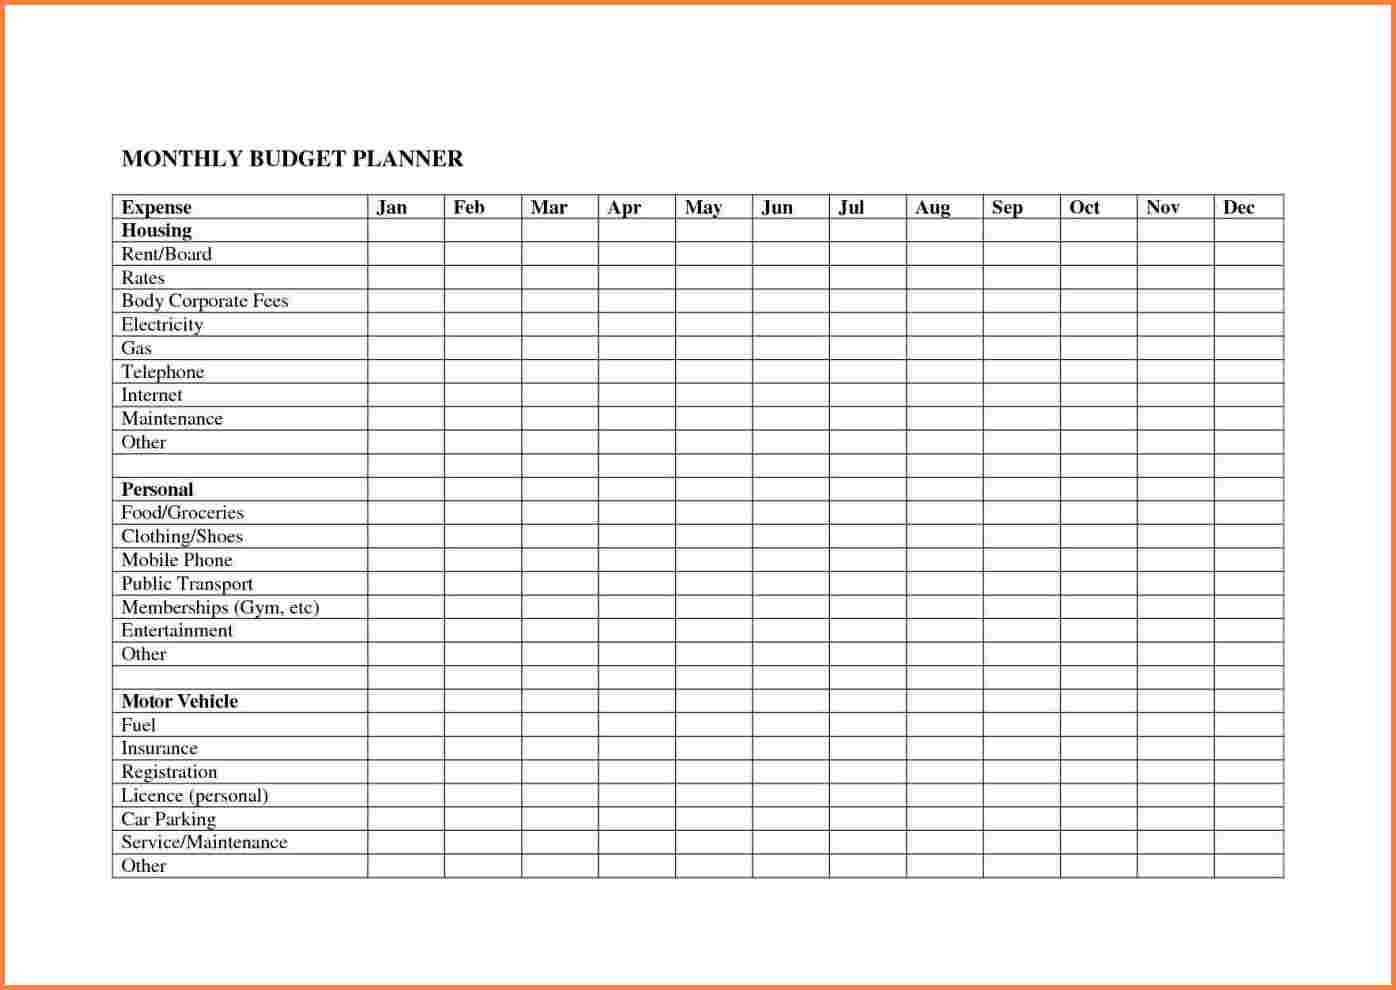 Free Budget Planner Spreadsheet Intended For Personal Budget Planner Spreadsheet  Resourcesaver